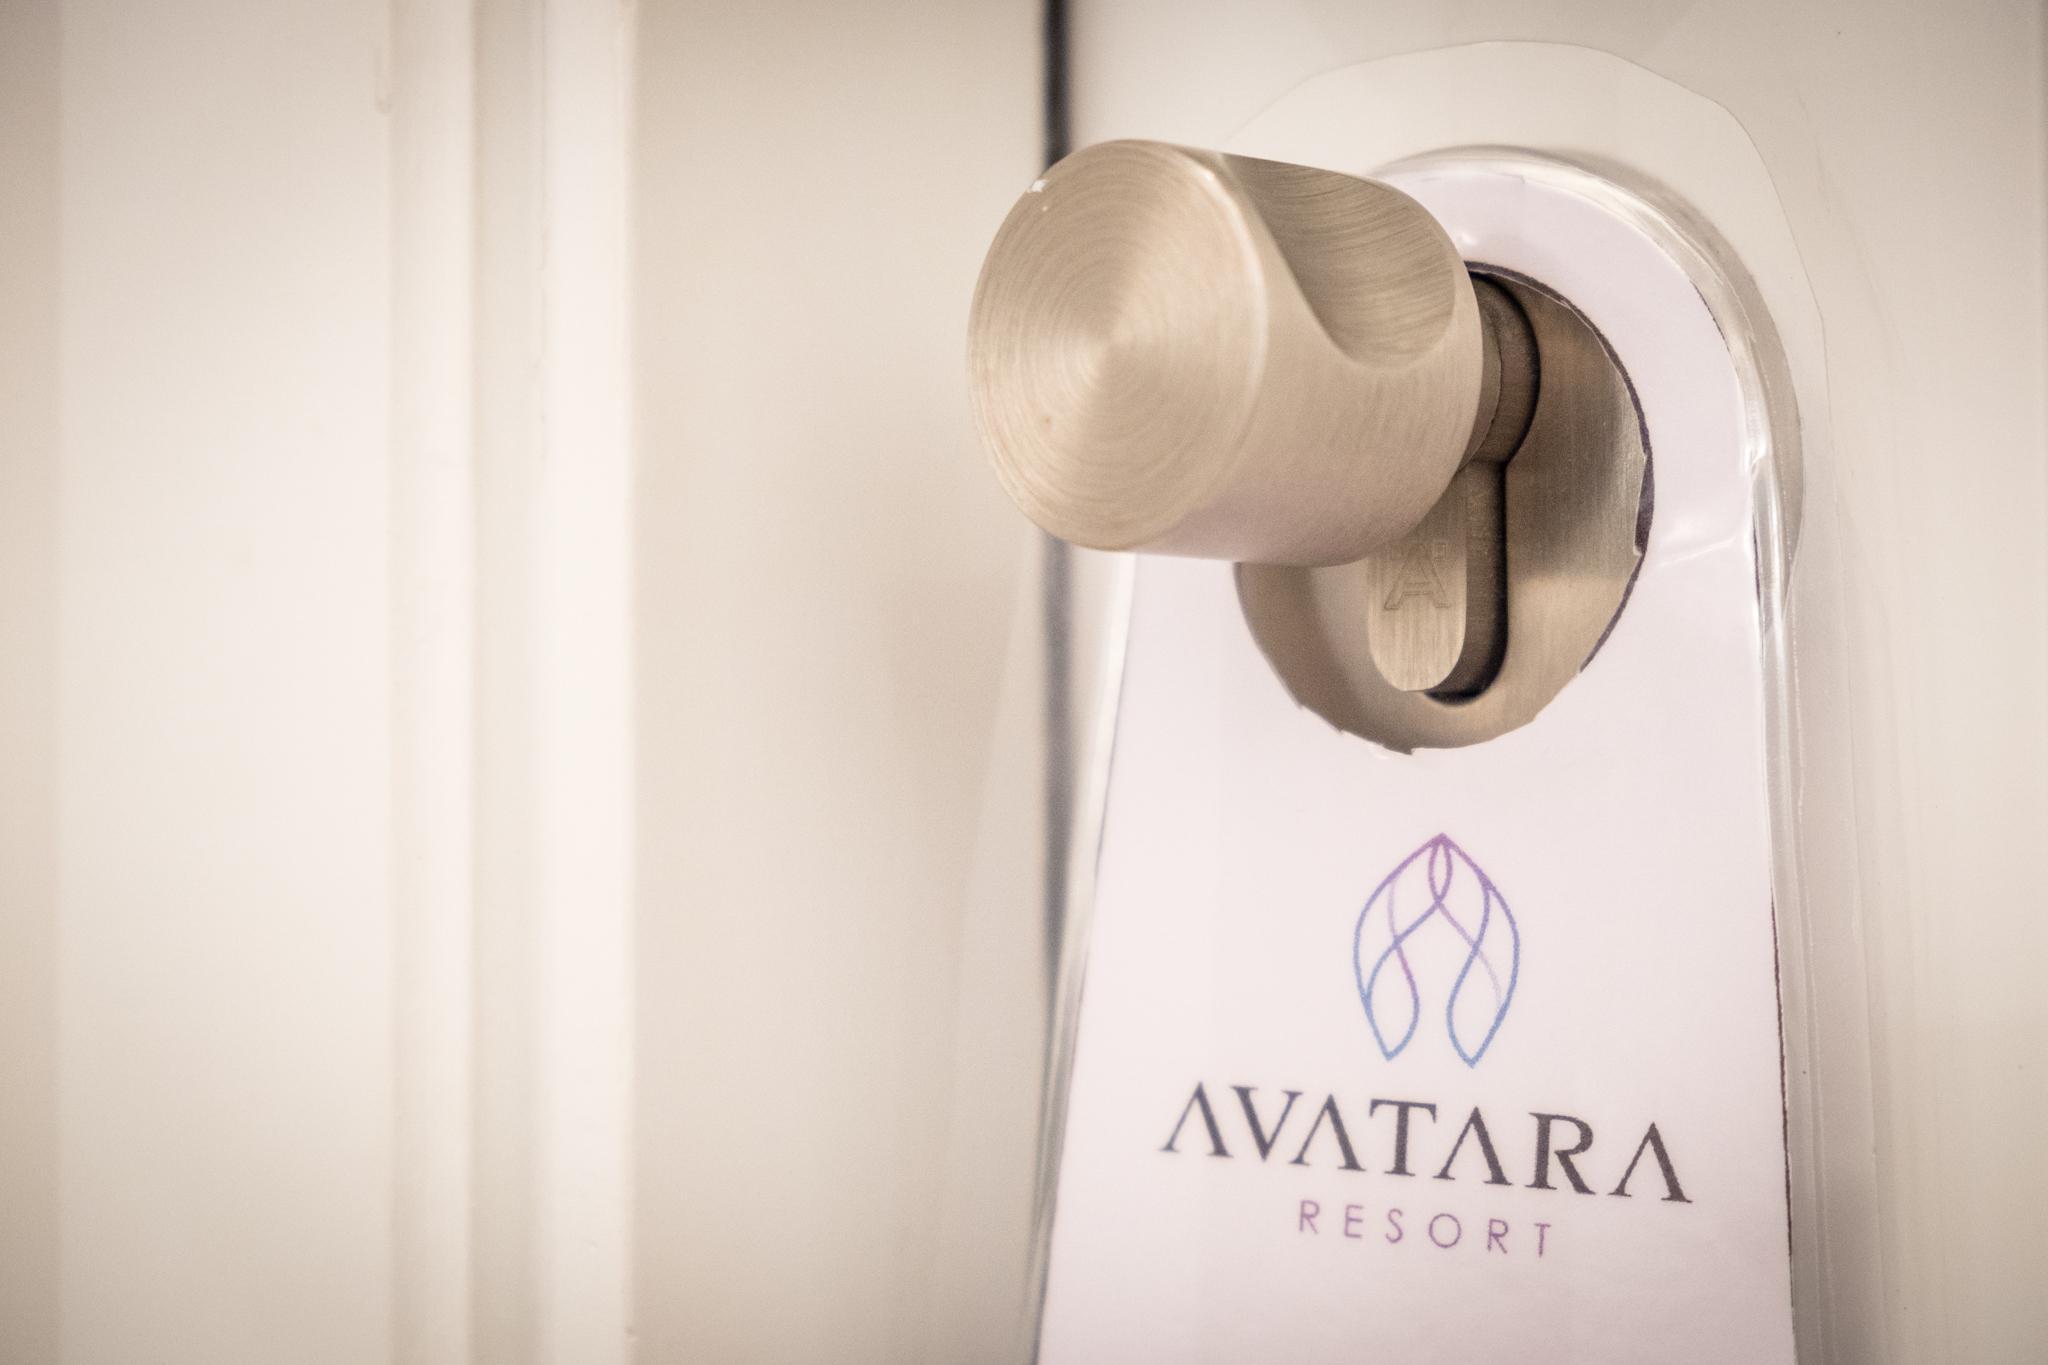 Avatara Resort,เอวาธารา รีสอร์ท